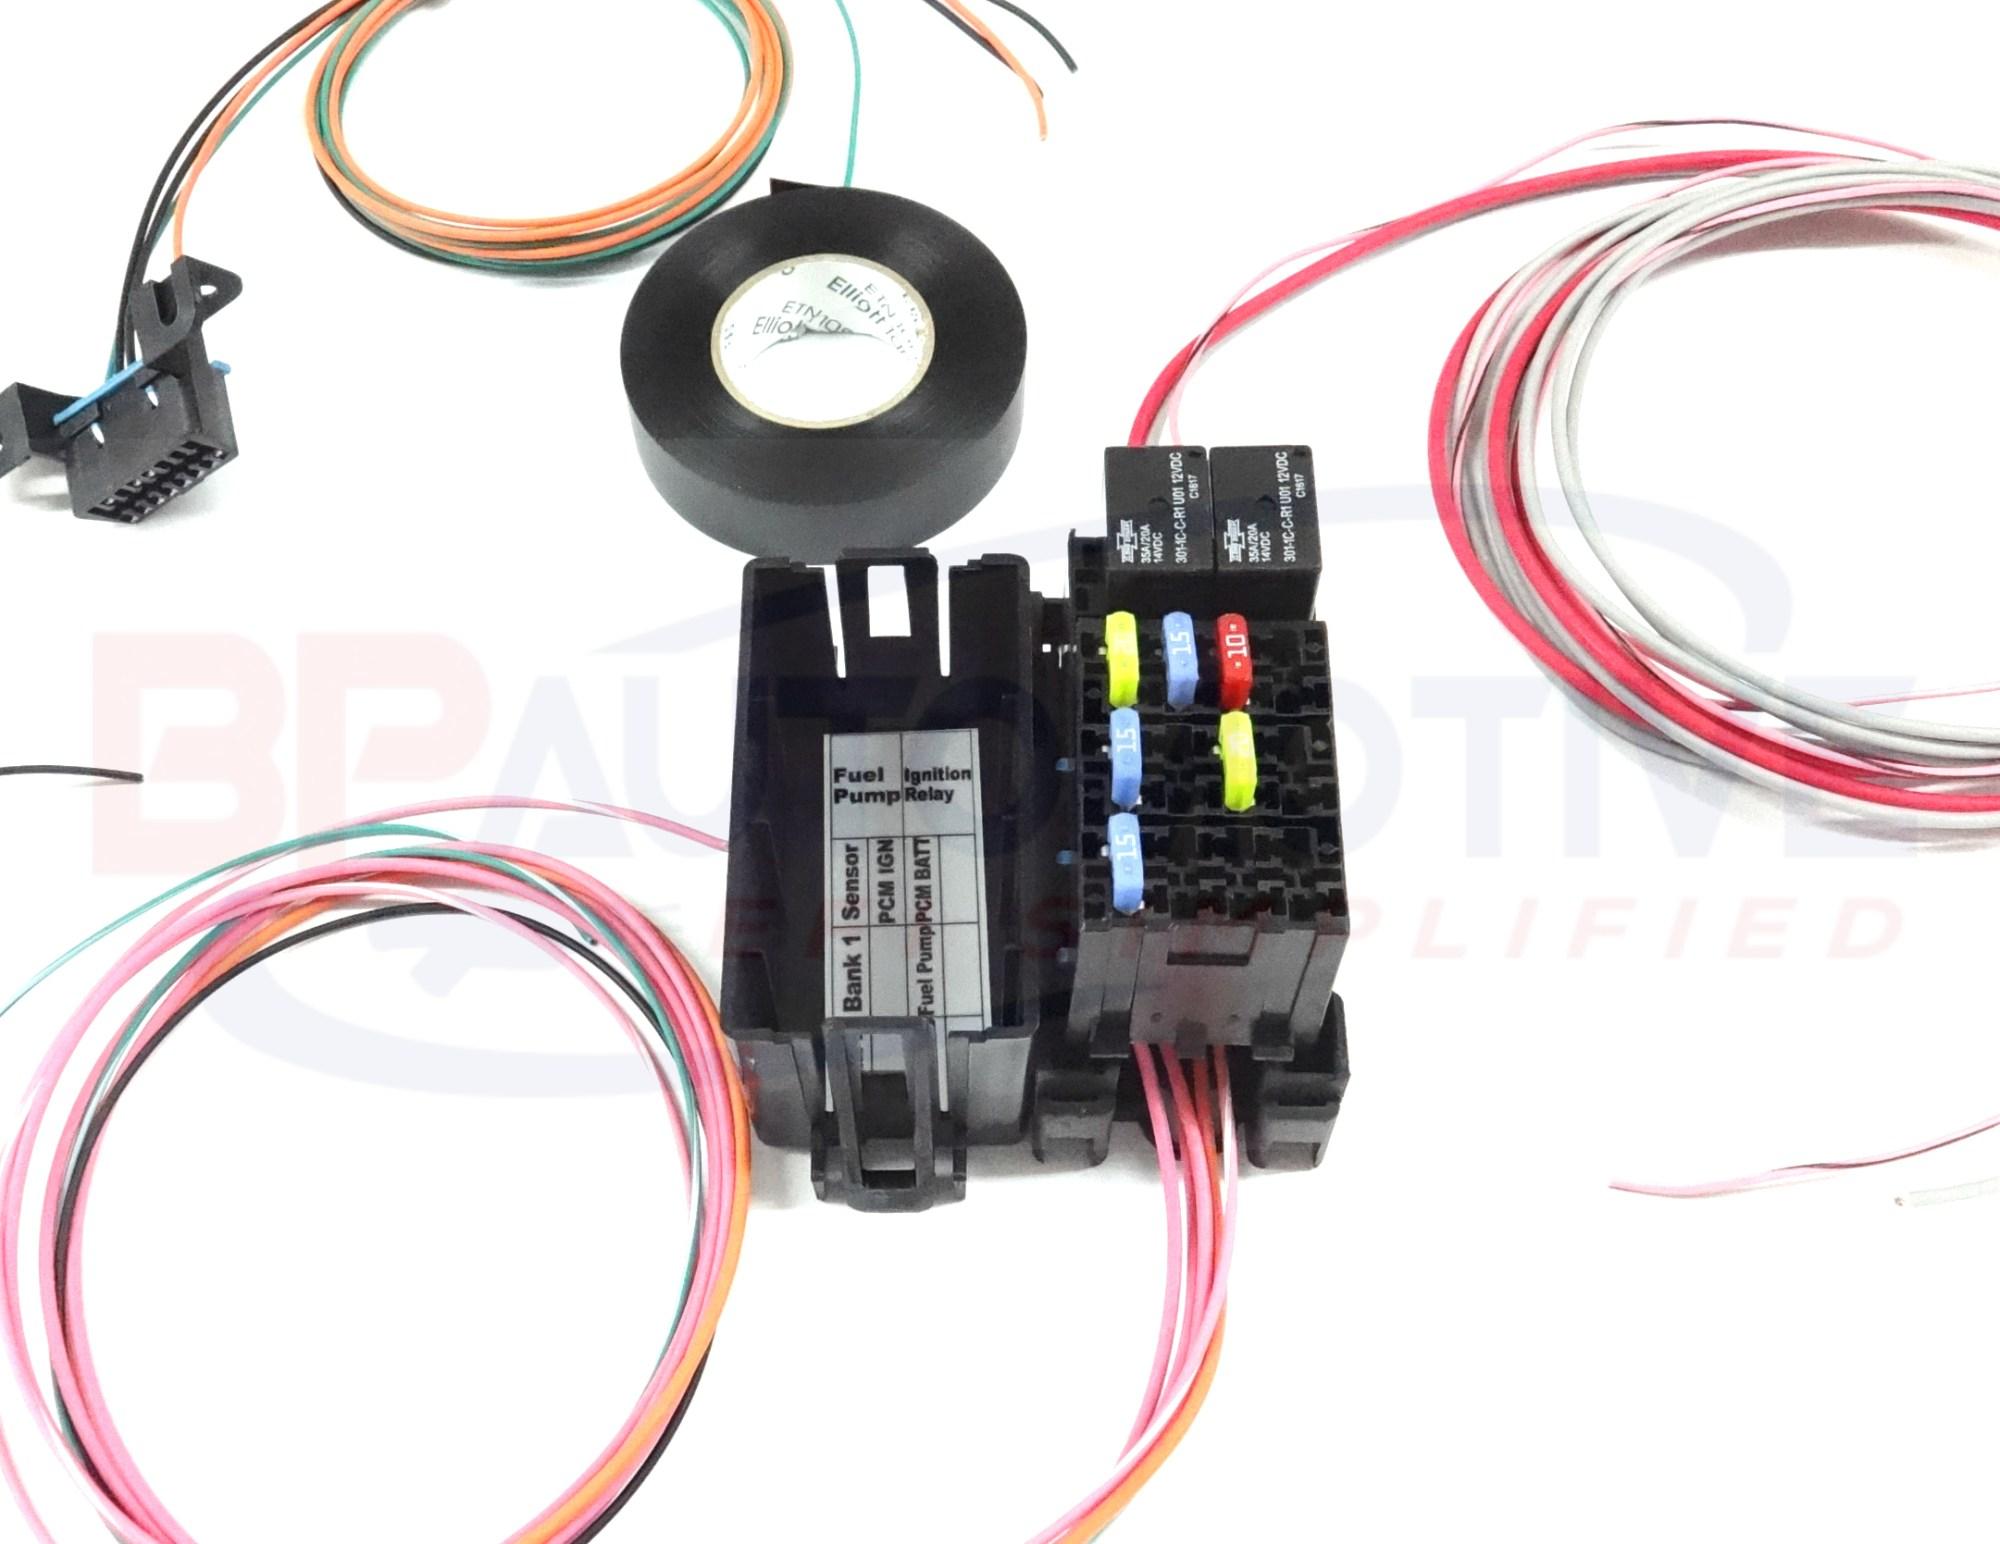 hight resolution of diy ls1 wiring harness wiring diagrams konsult ls1 wiring harness diagram missing c220 diy ls1 wiring